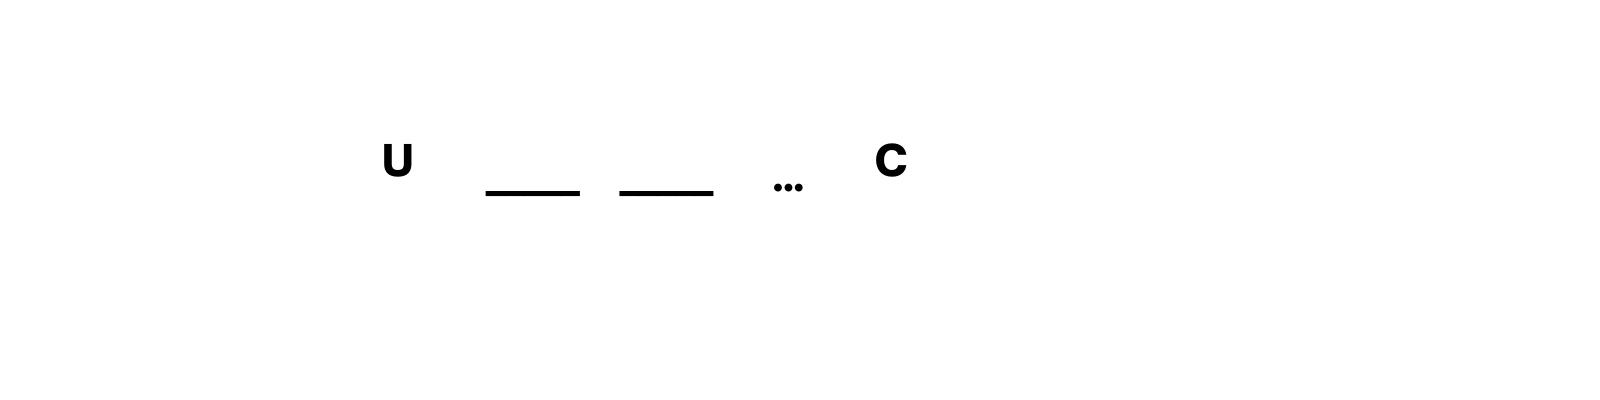 U then two empty spots then an ellipsis then C